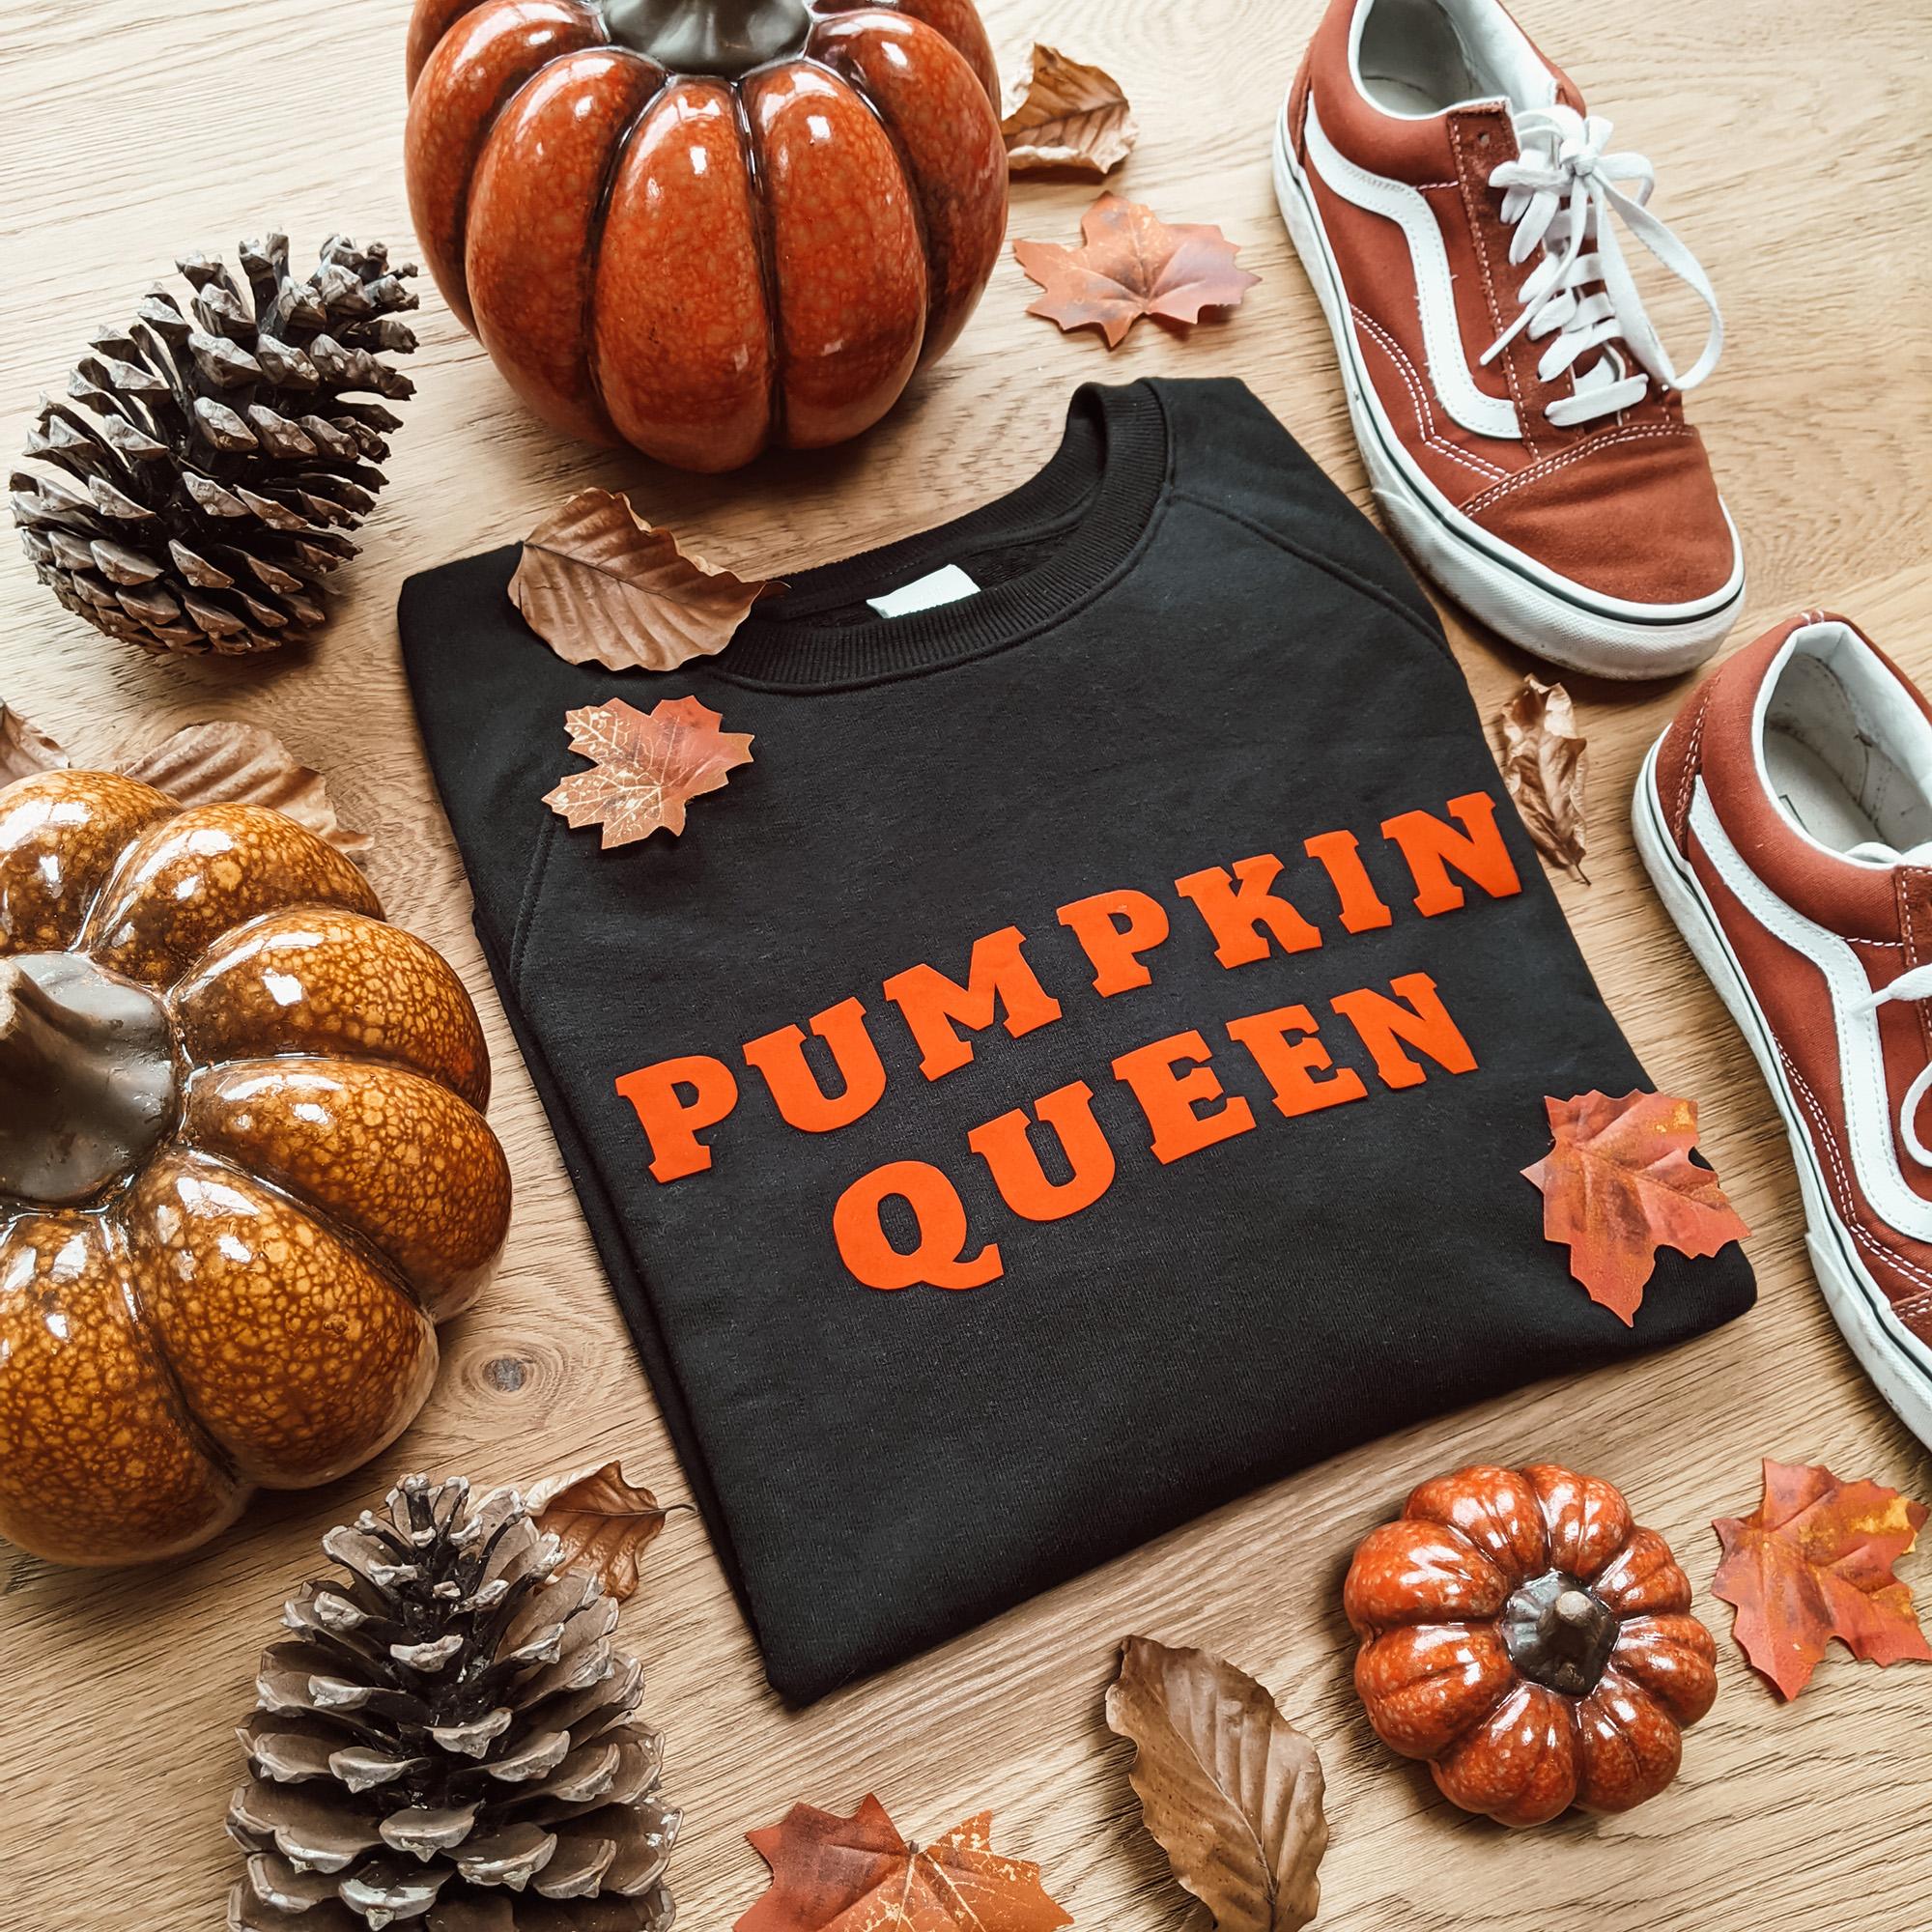 Oktoberdots Pumpkin Queen Sweater